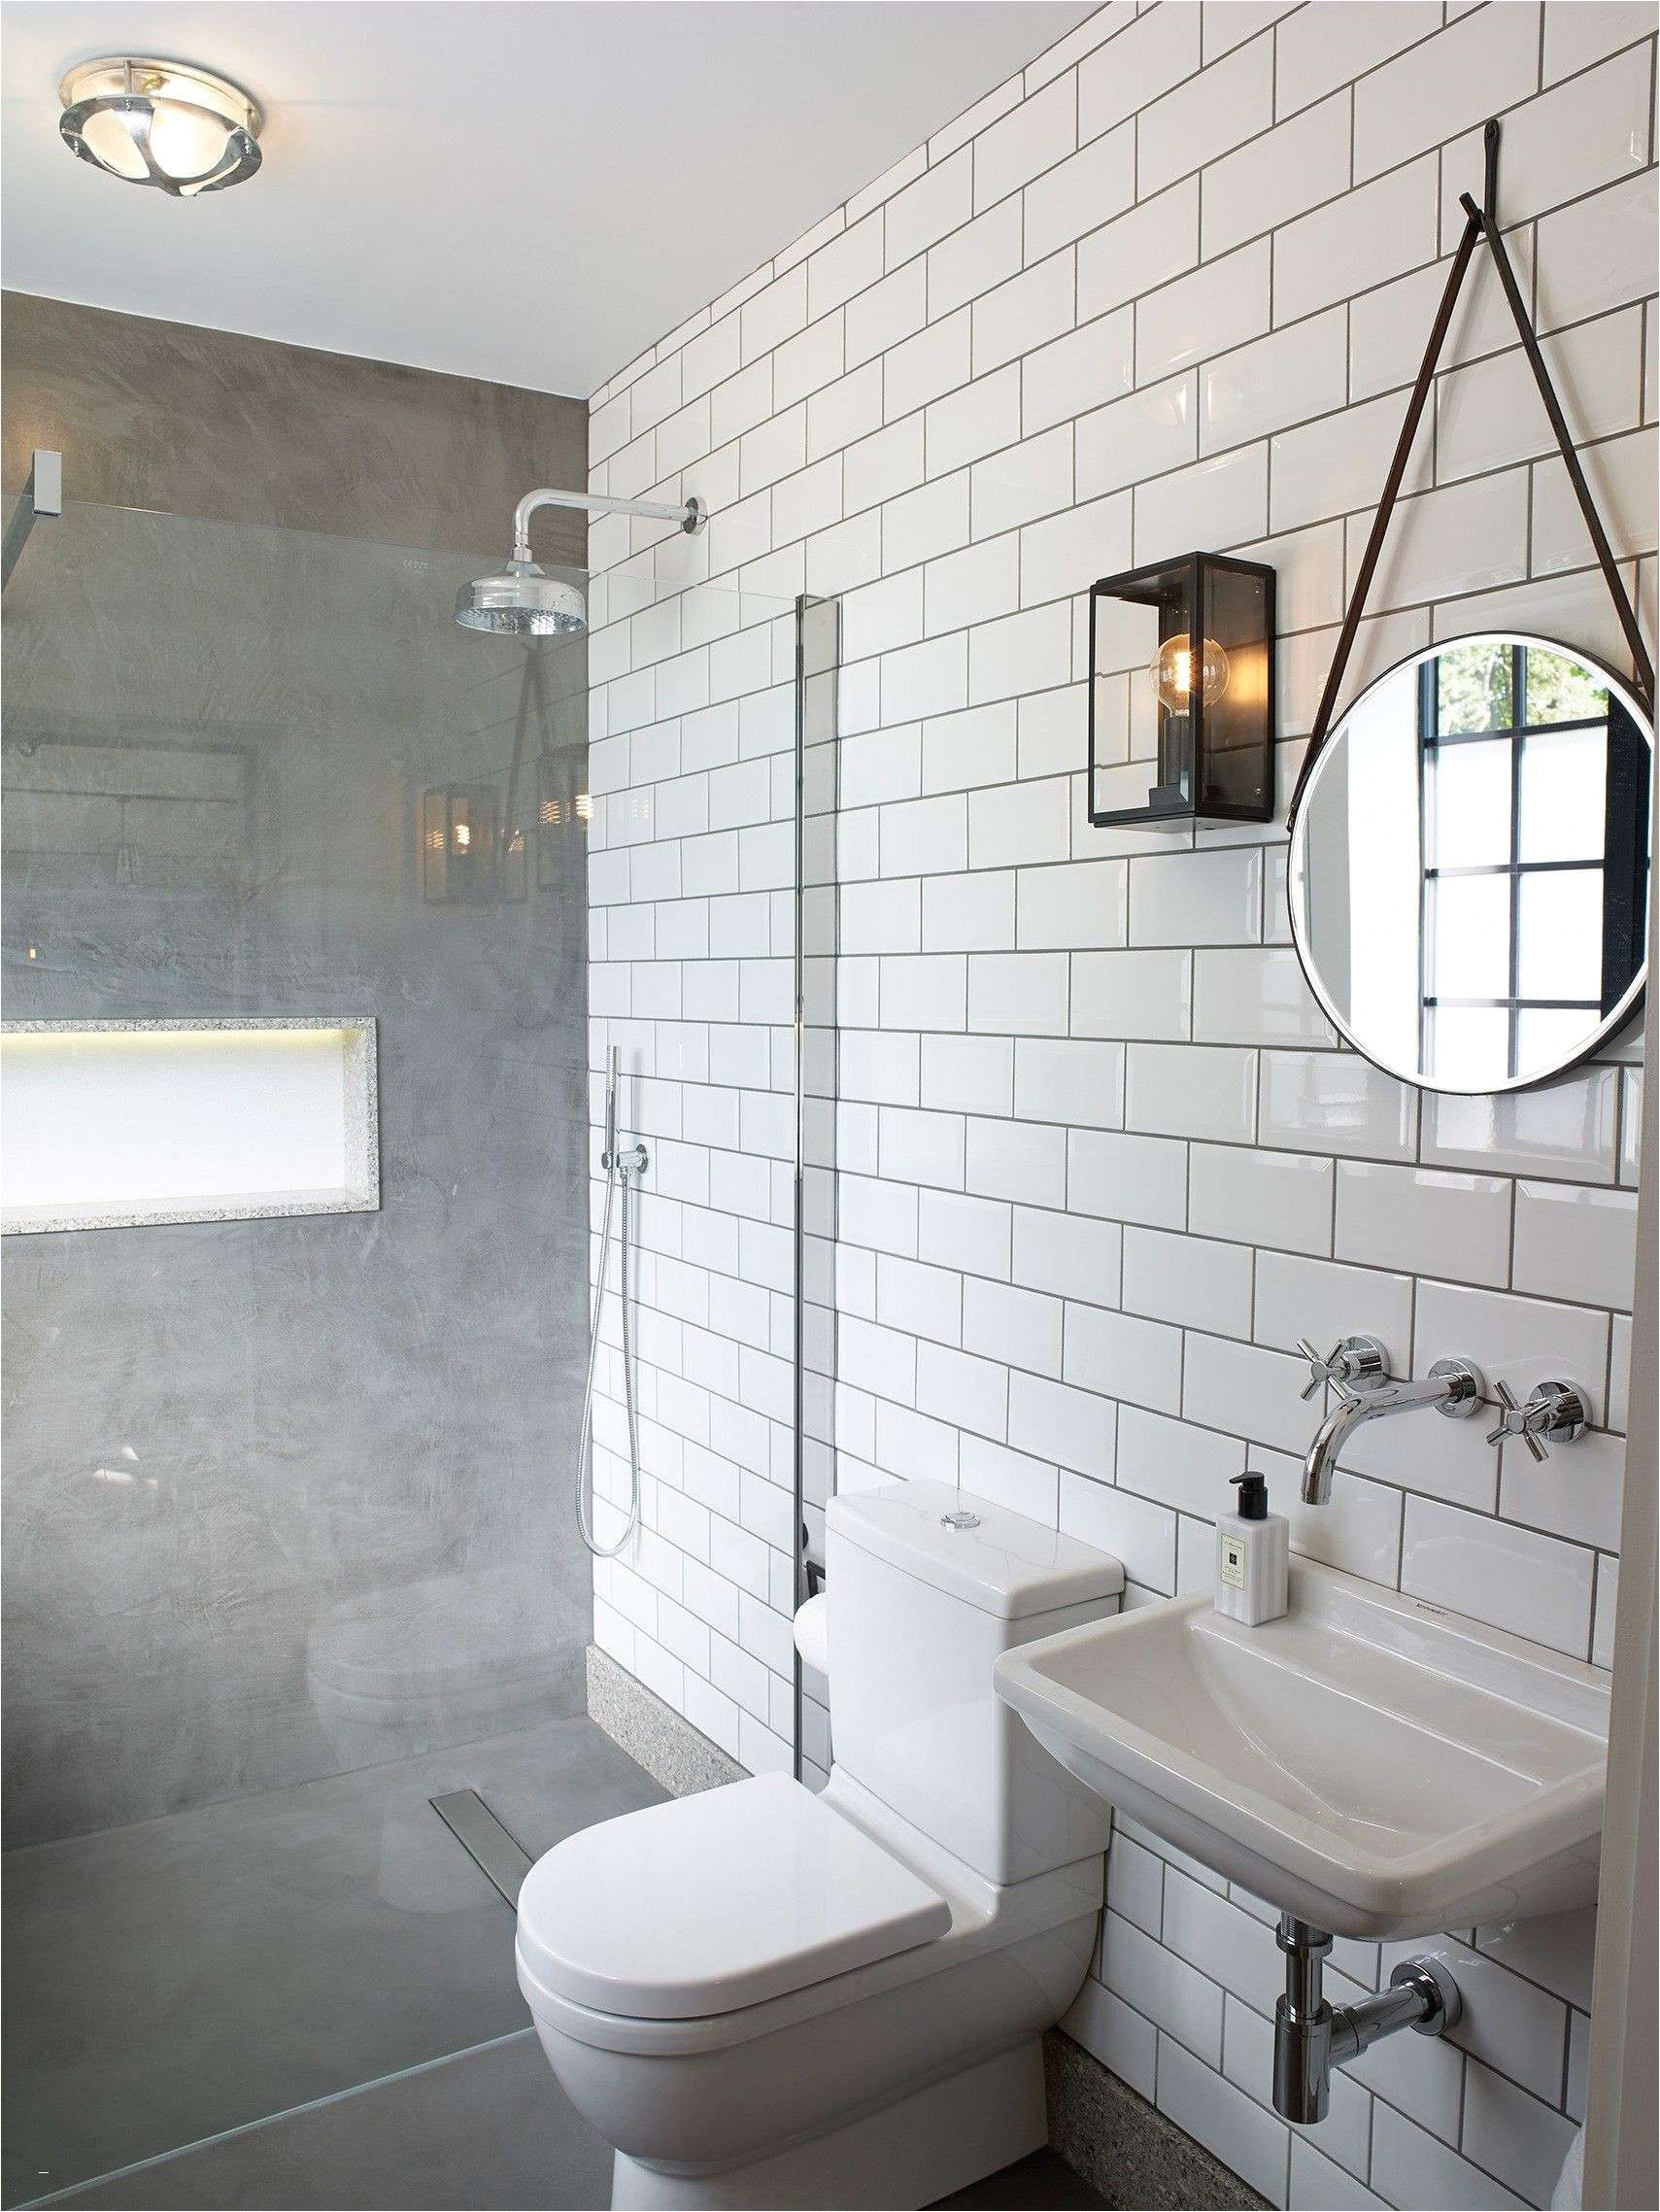 Bathroom Fixtures Design Ideas Bathroom Wall Decor Ideas Incredible Tag toilet Ideas 0d Mucsat In